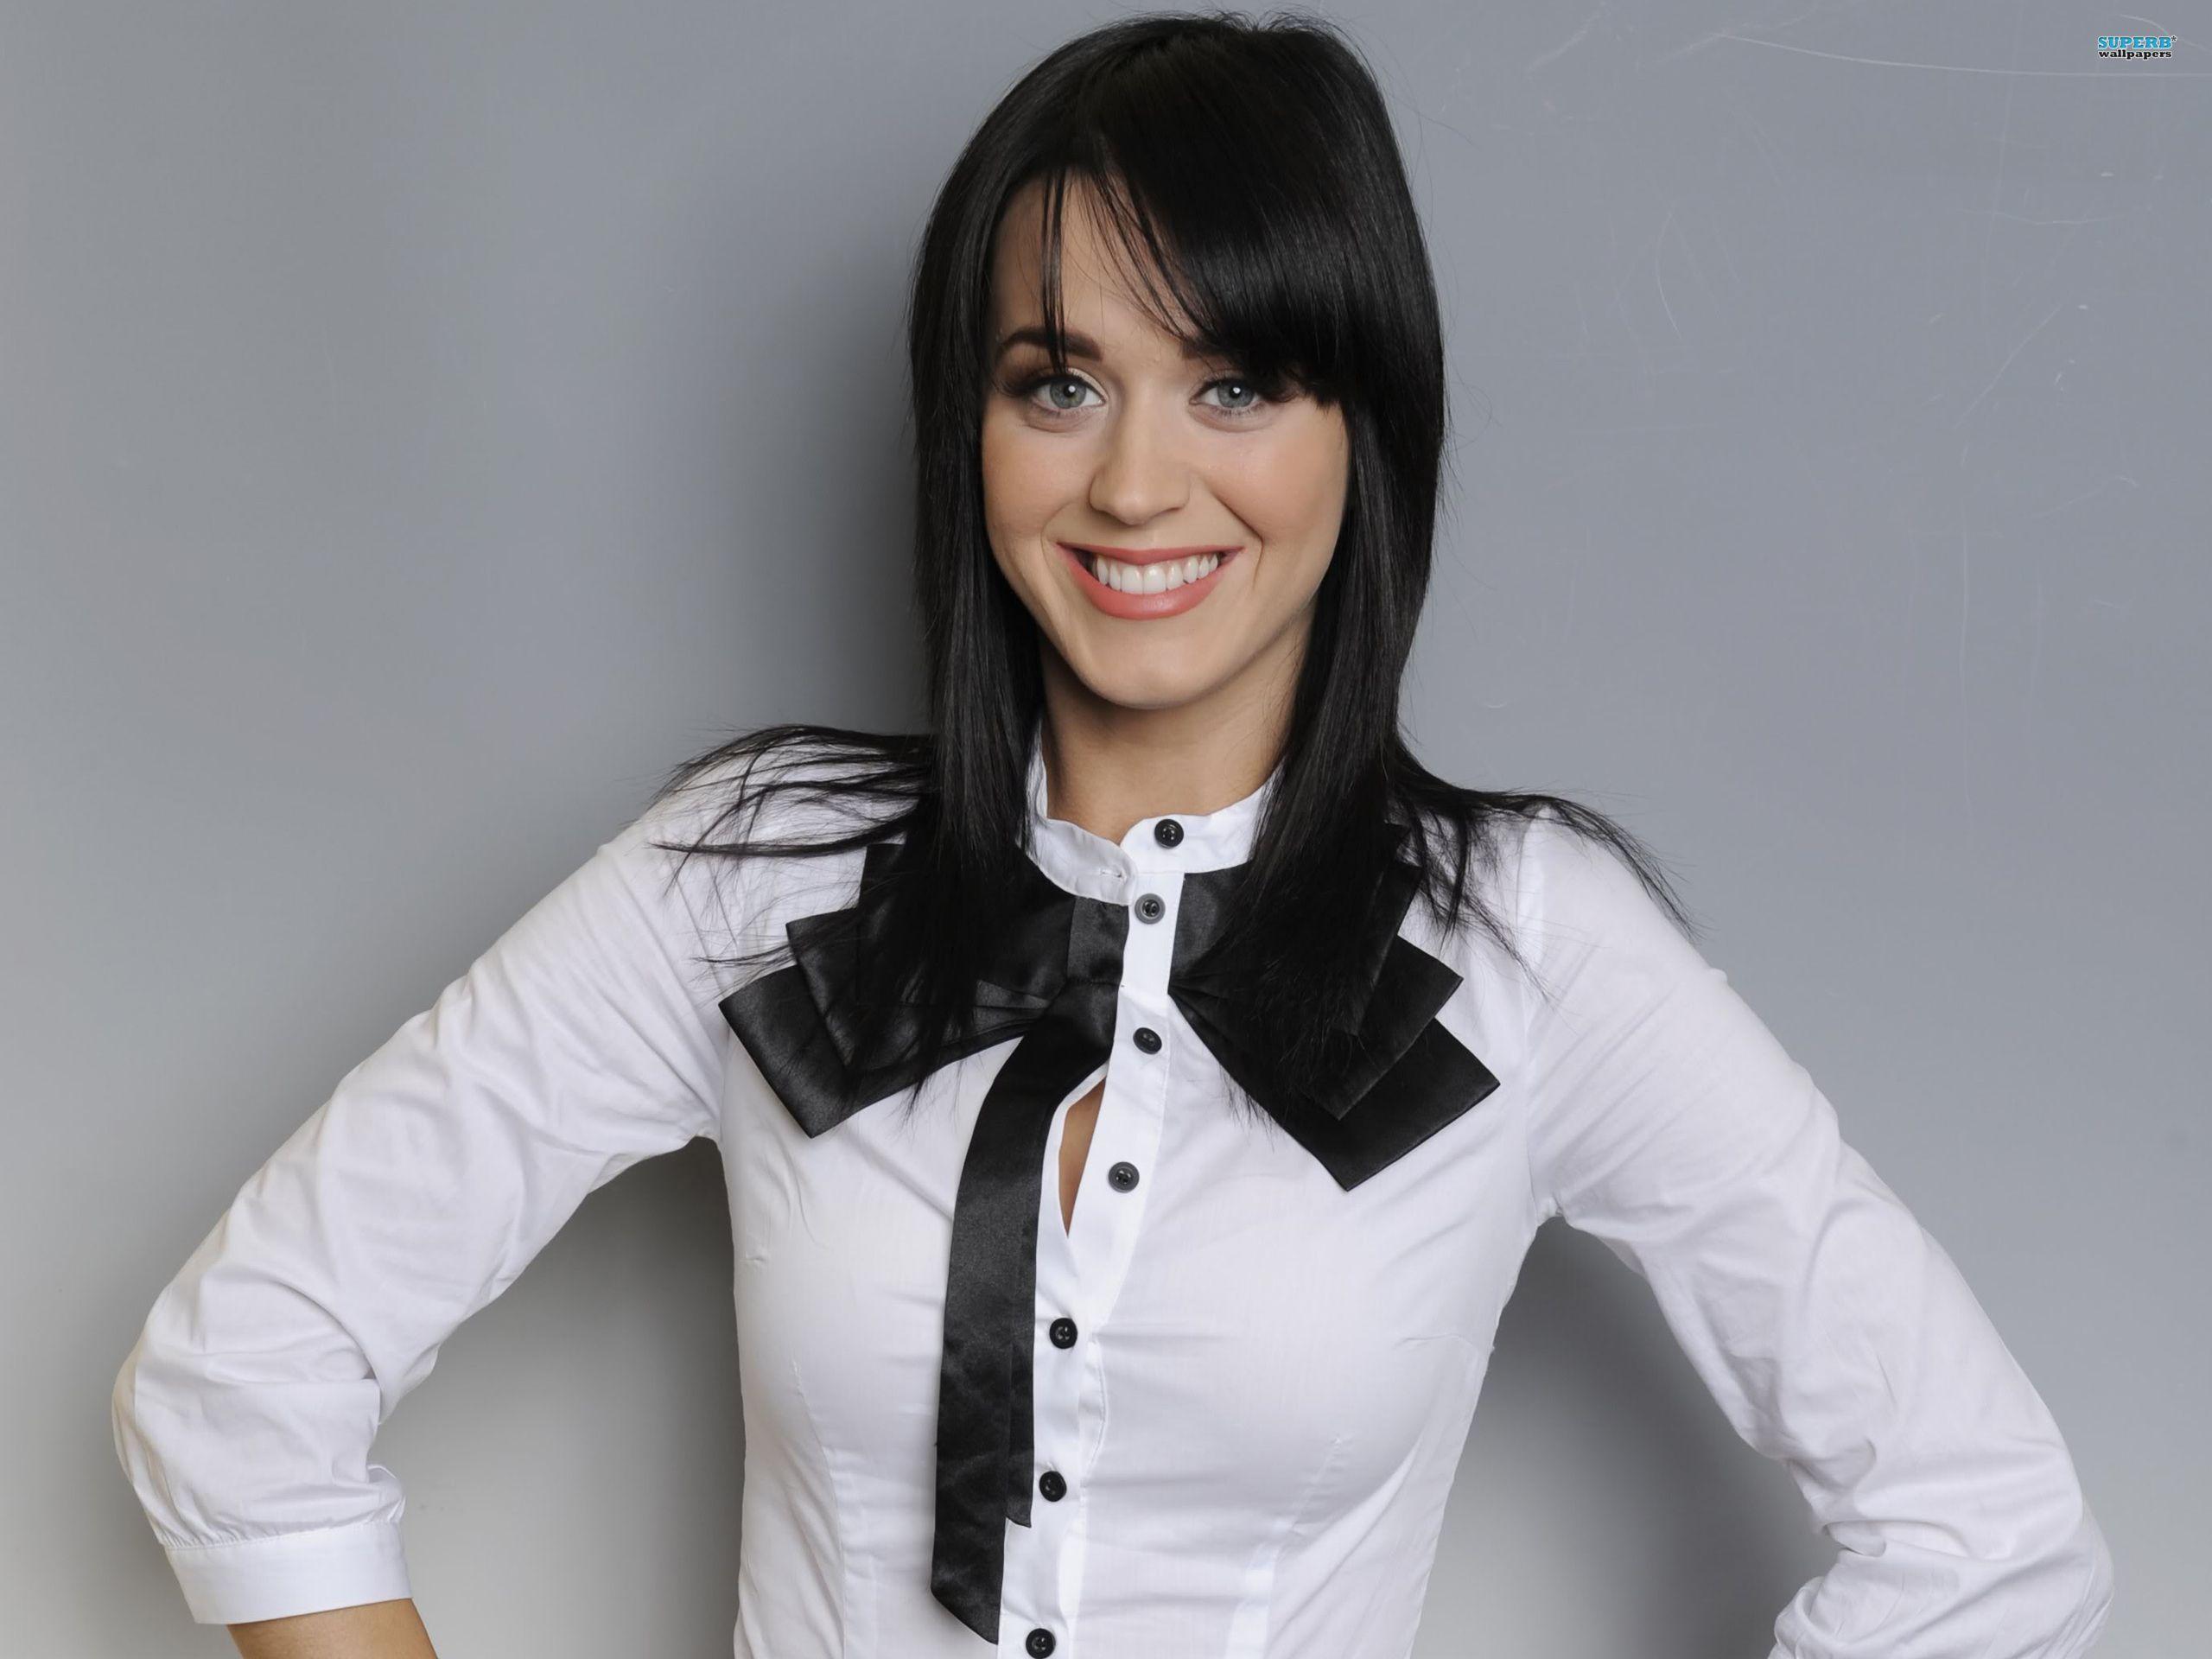 Katy perry iphone wallpaper tumblr - Katy Perry Fondos De Escritorio De Katy Perry Fondos De Pantalla De Katy Perry